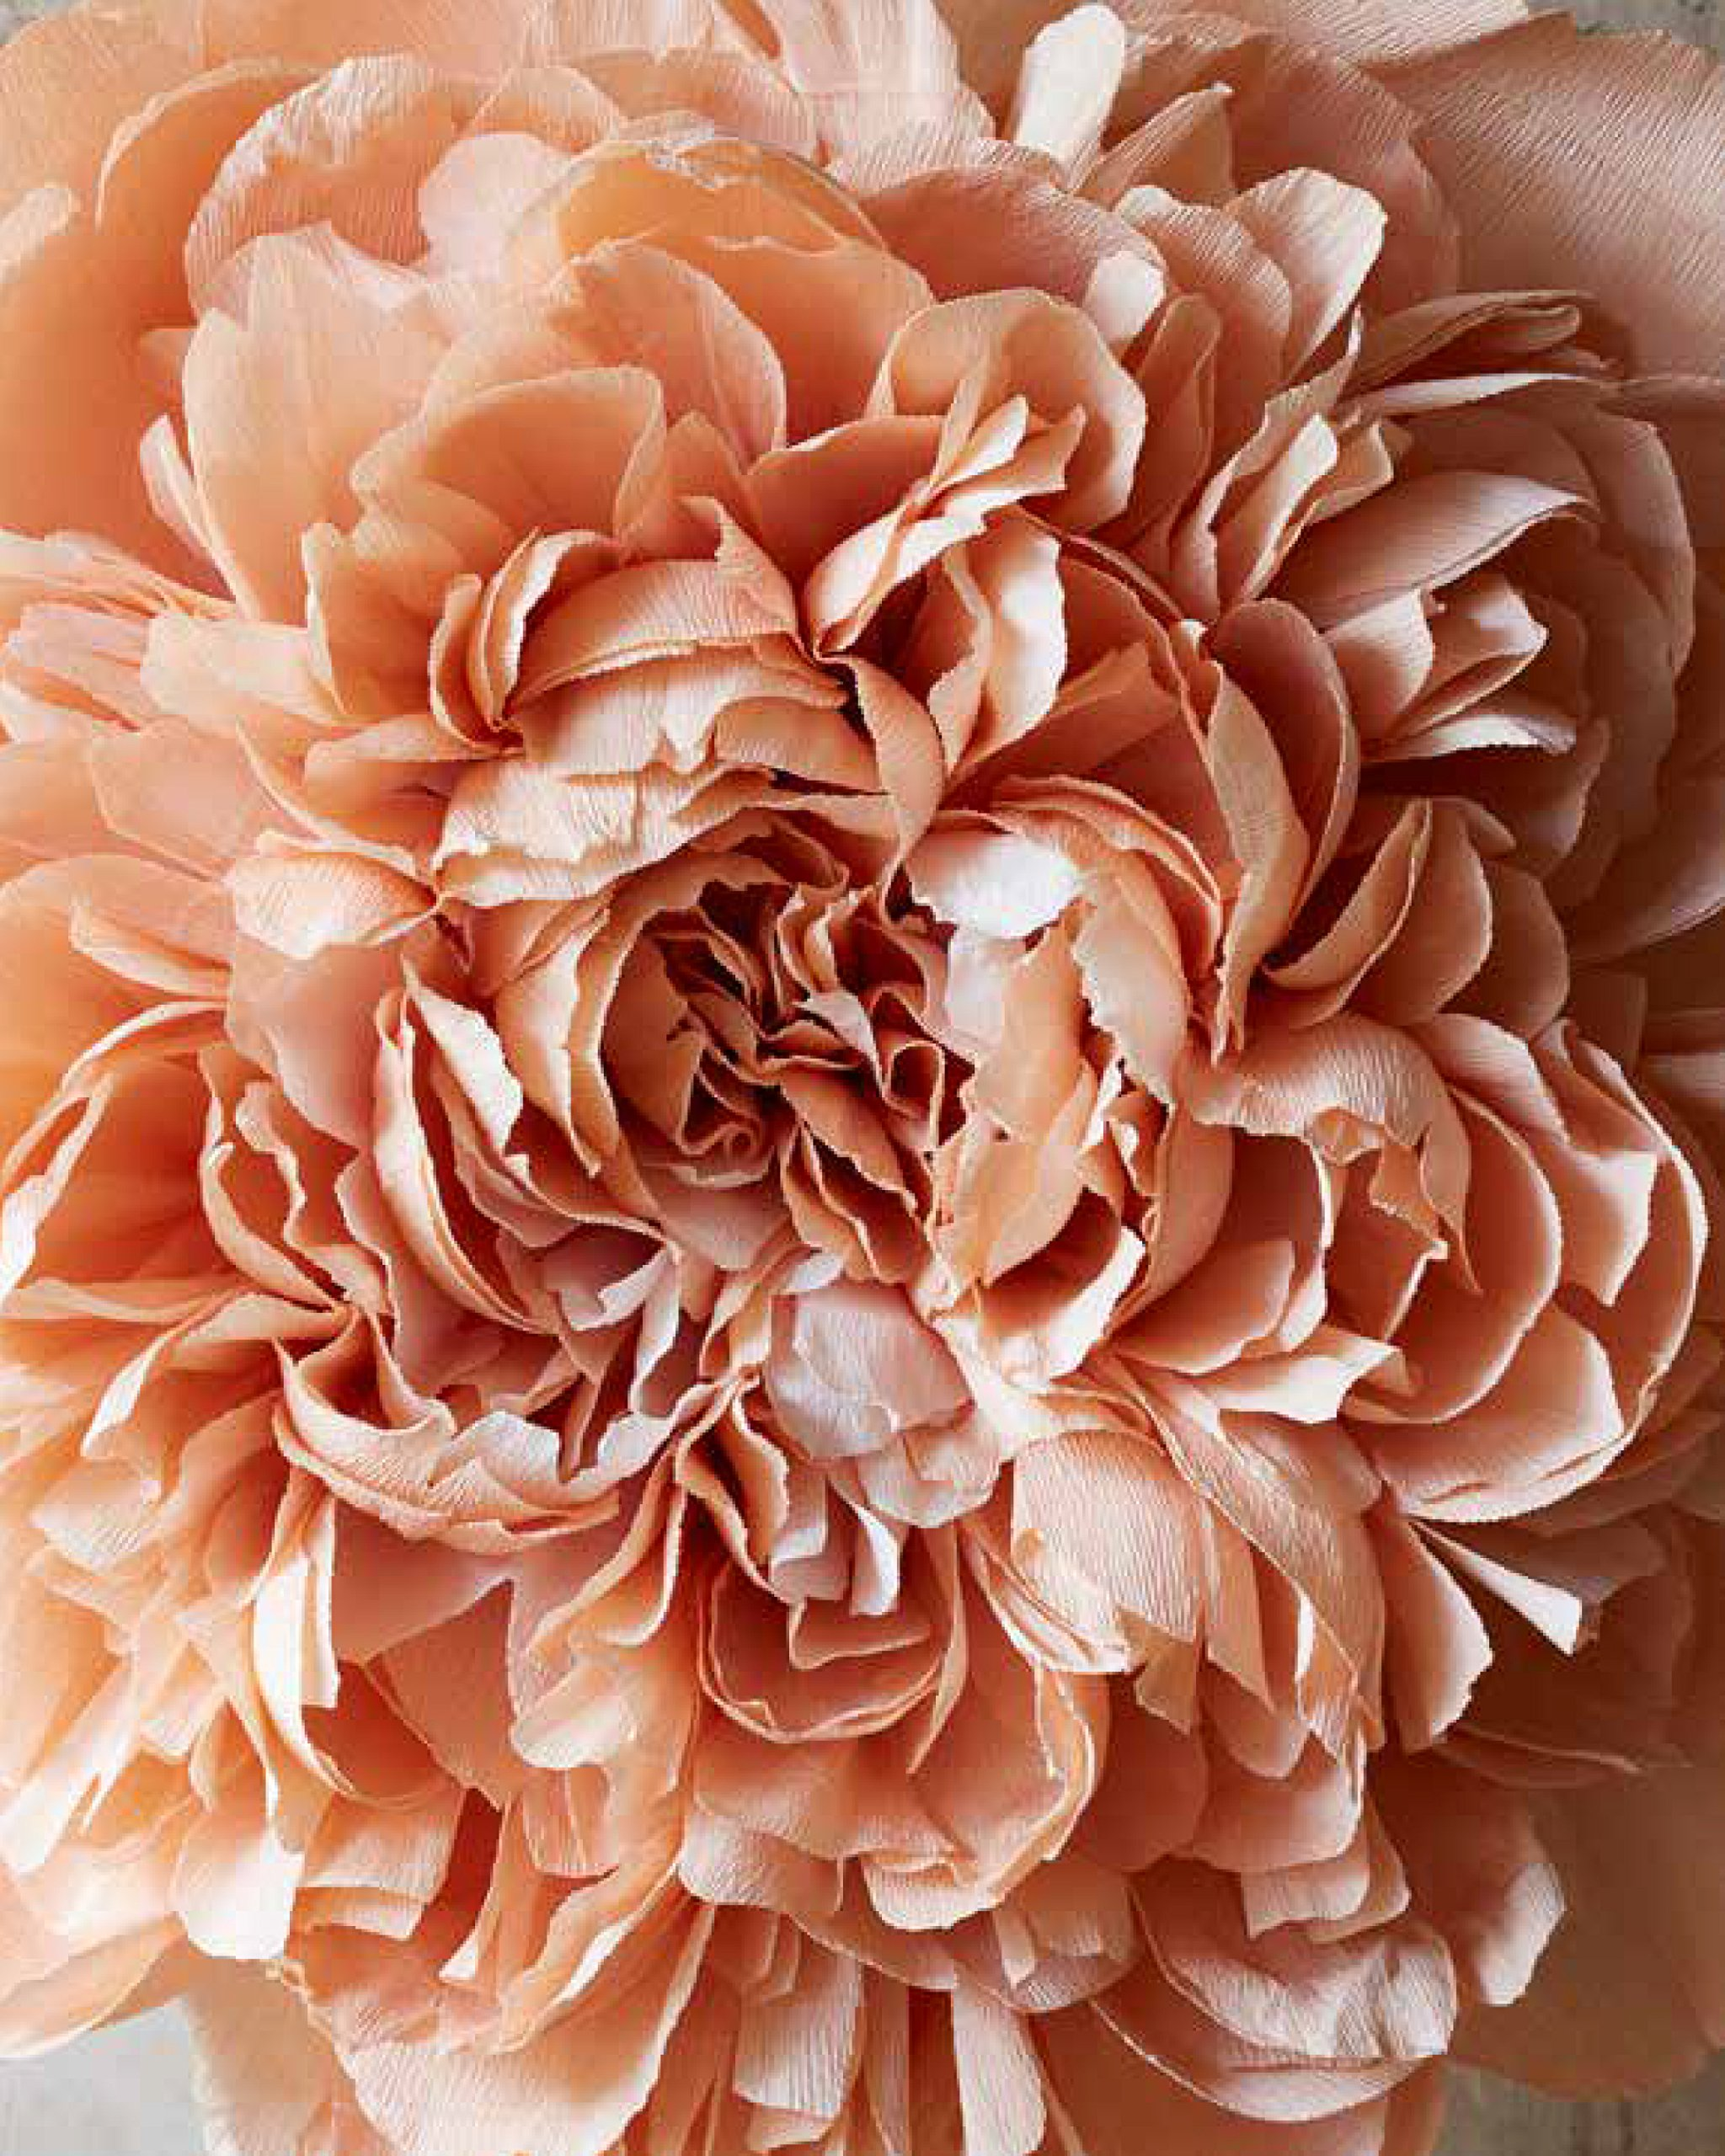 The fine art of paper flowers a guide to making beautiful and the fine art of paper flowers a guide to making beautiful and lifelike botanicals tiffanie turner aya brackett 9780399578373 amazon books izmirmasajfo